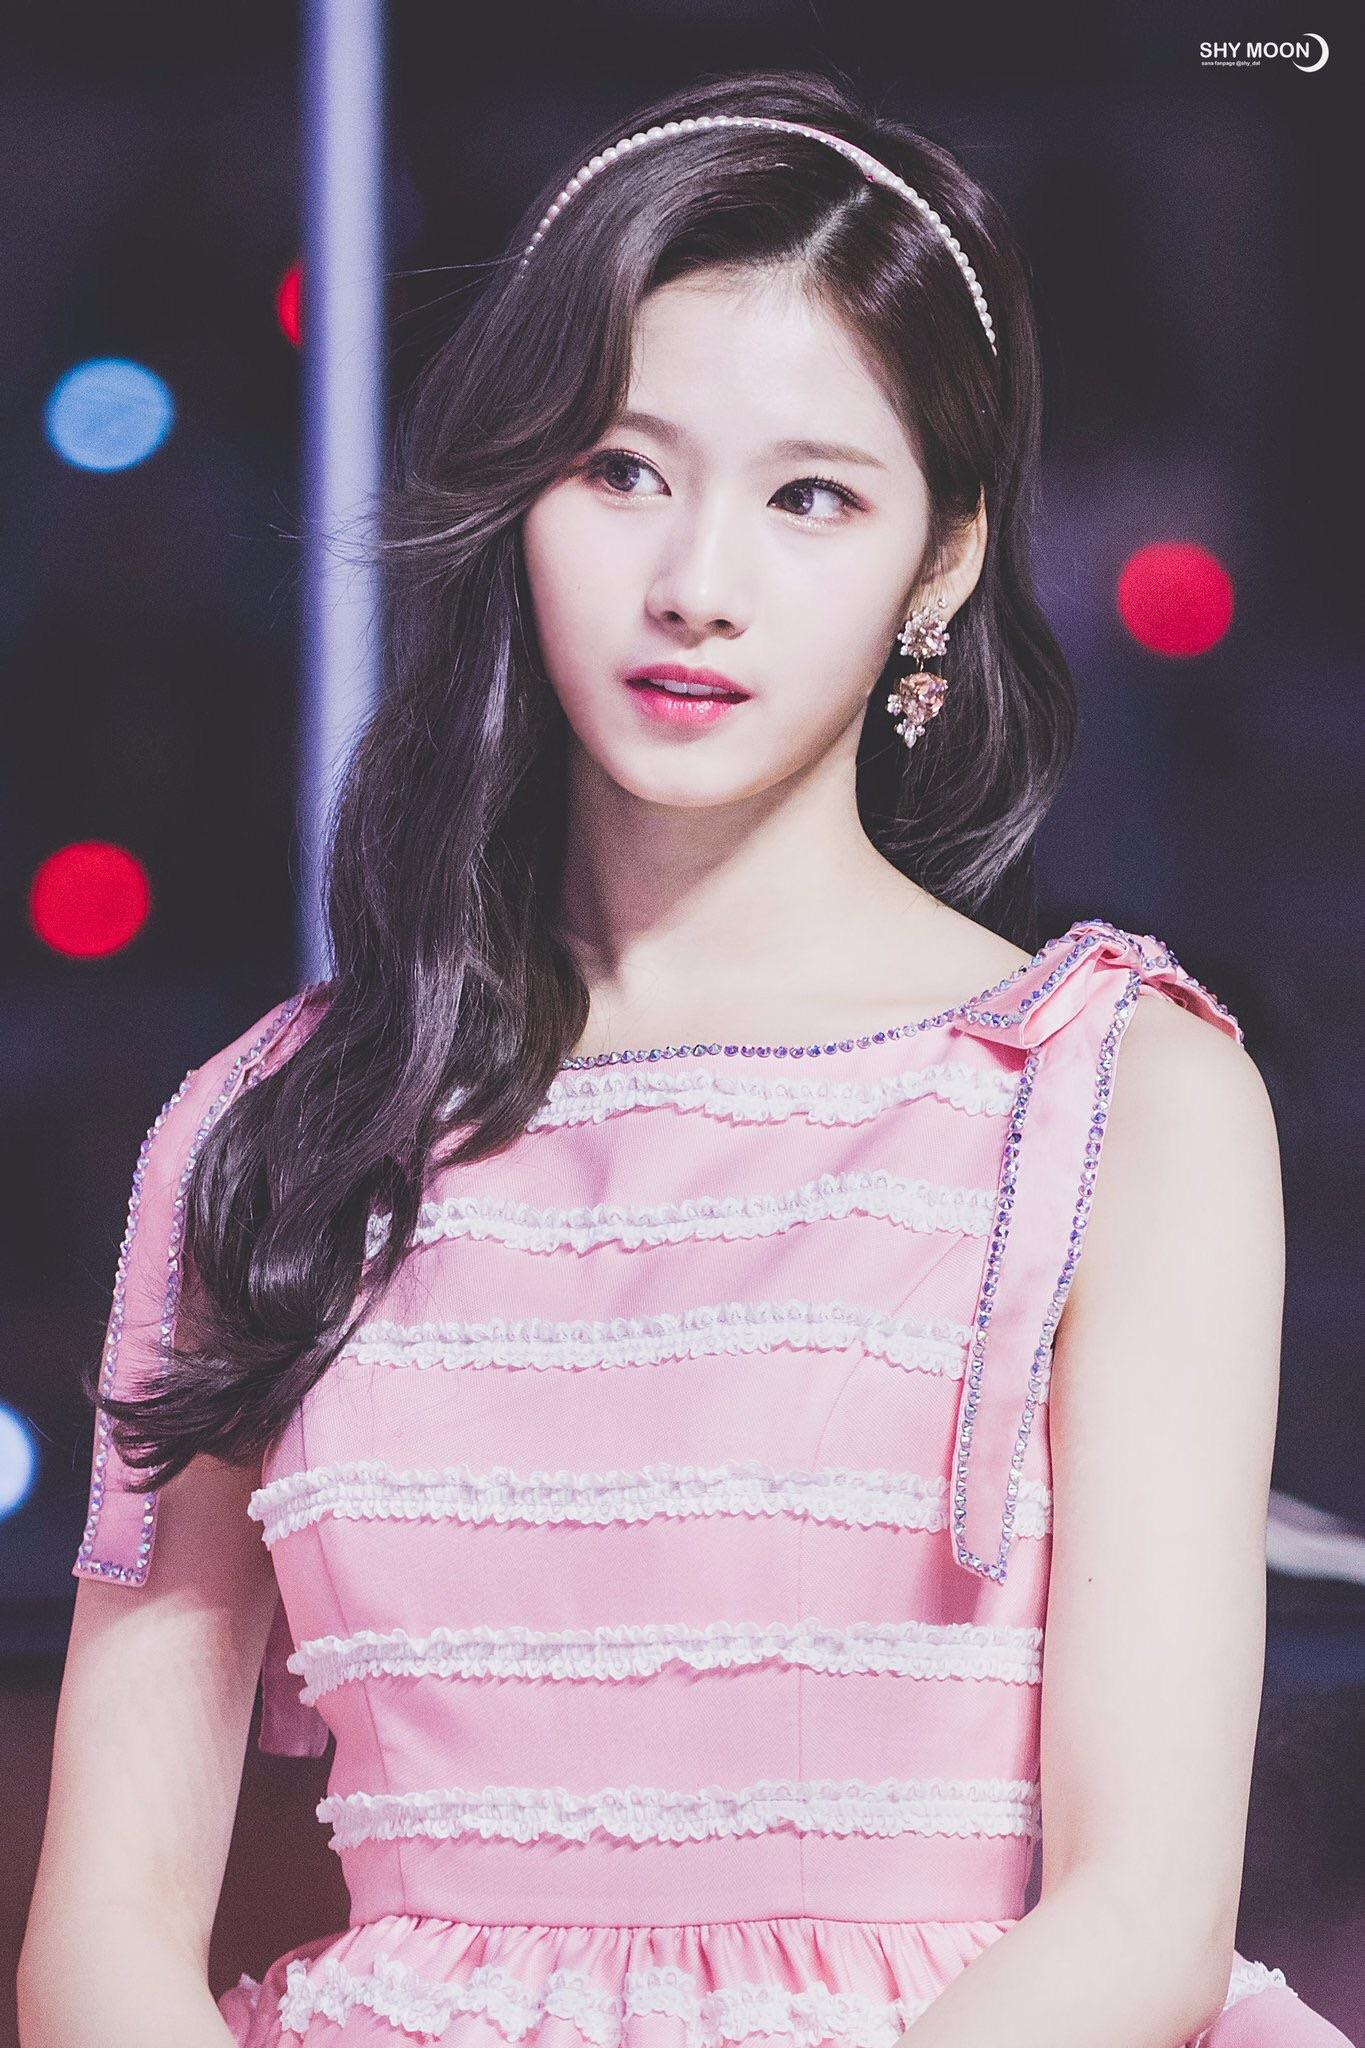 Dahyun Twice Beautiful Girl Wallpaper Japan Created An Angel And Her Name Is Minatozaki Sana